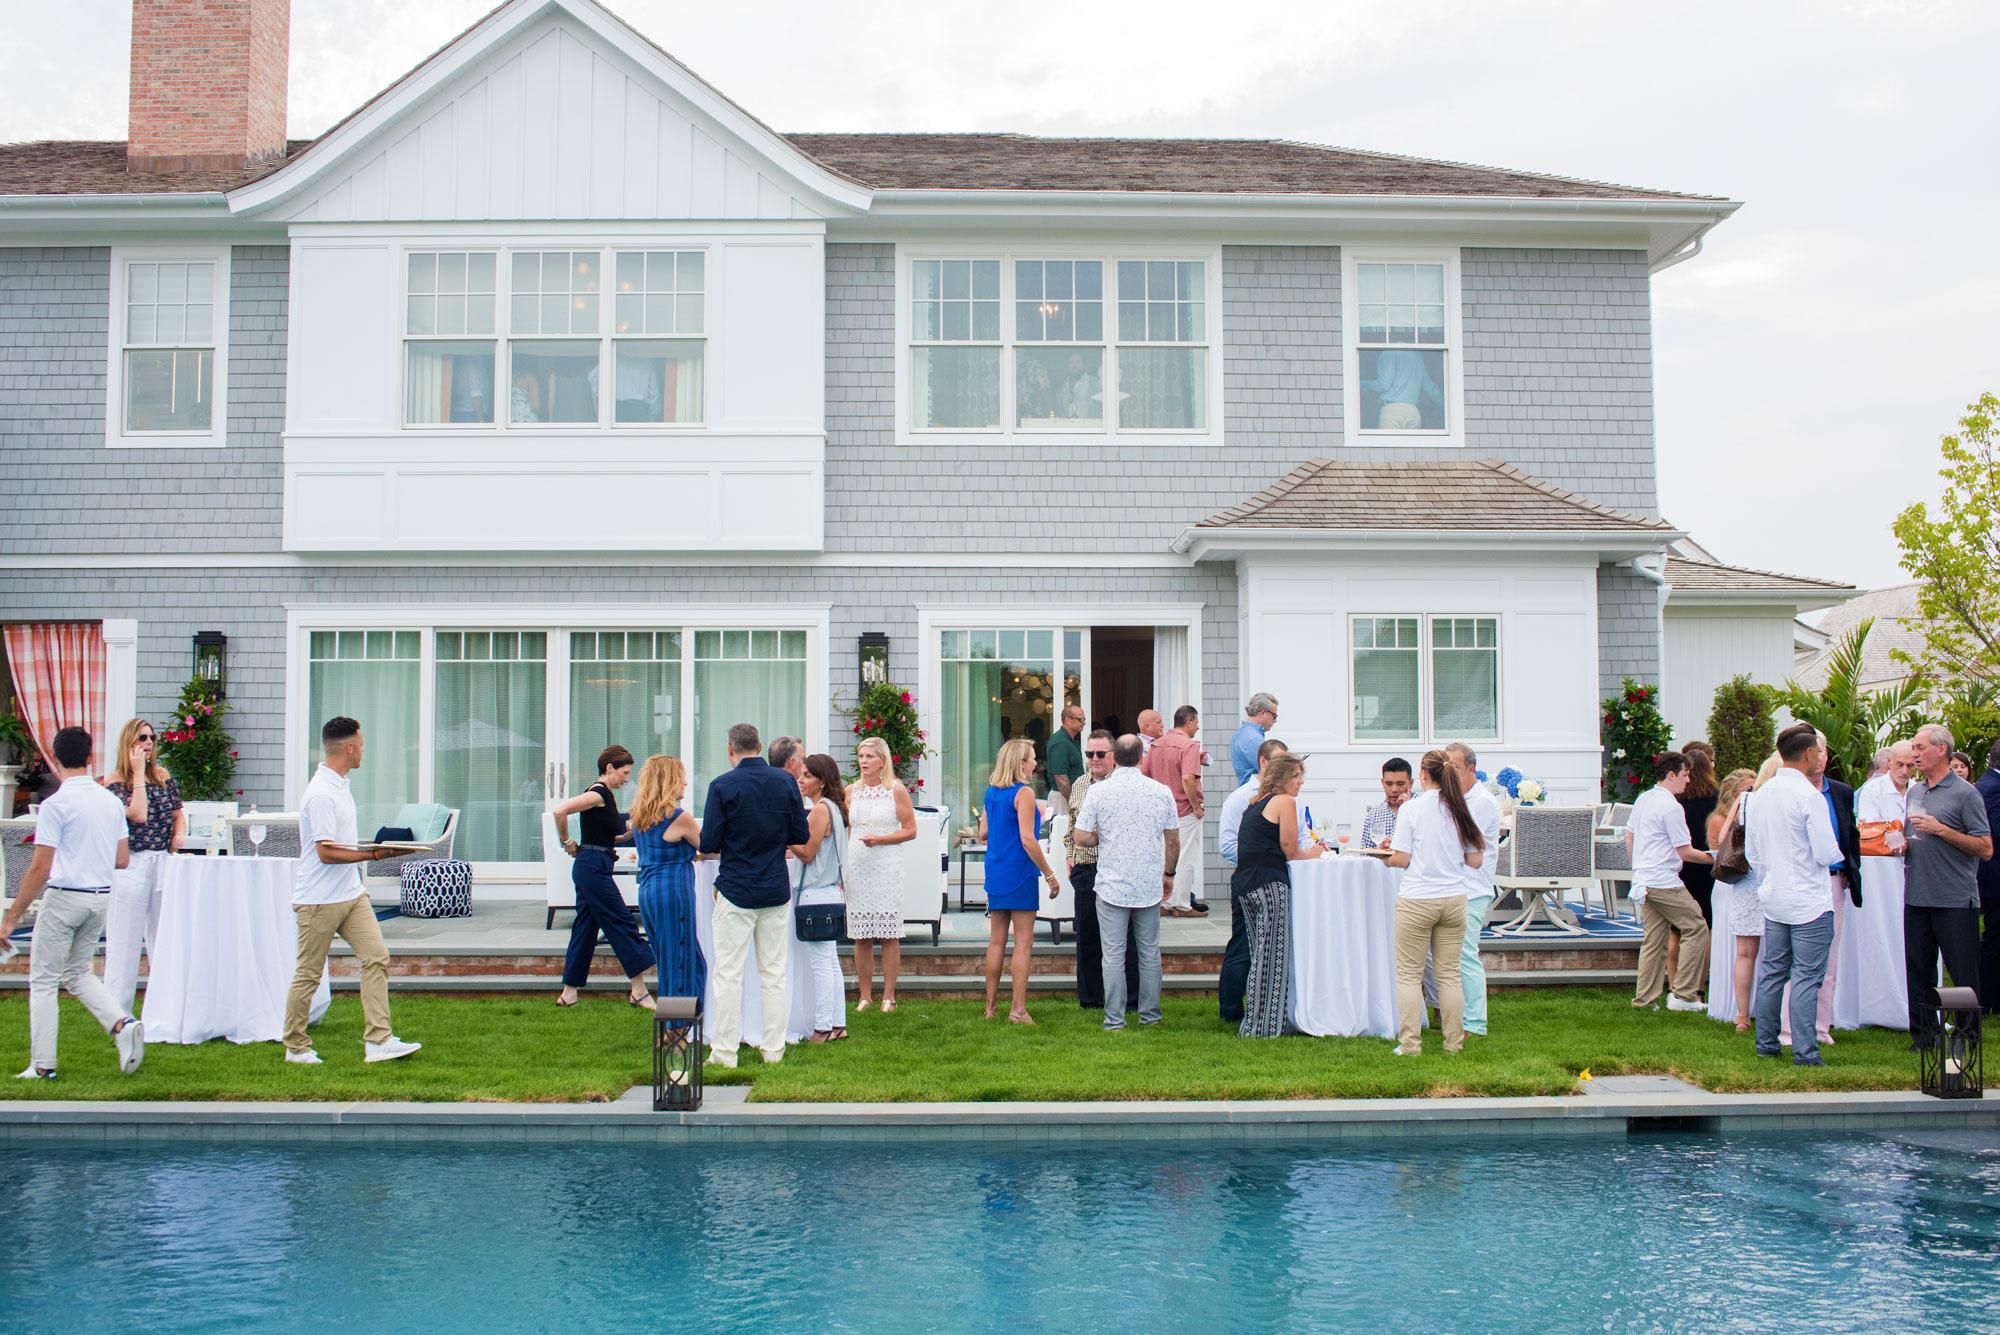 2017 Hampton Designer Showhouse – Fire Island and Beyond on hampton design, hampton designer bedrooms, hampton home,